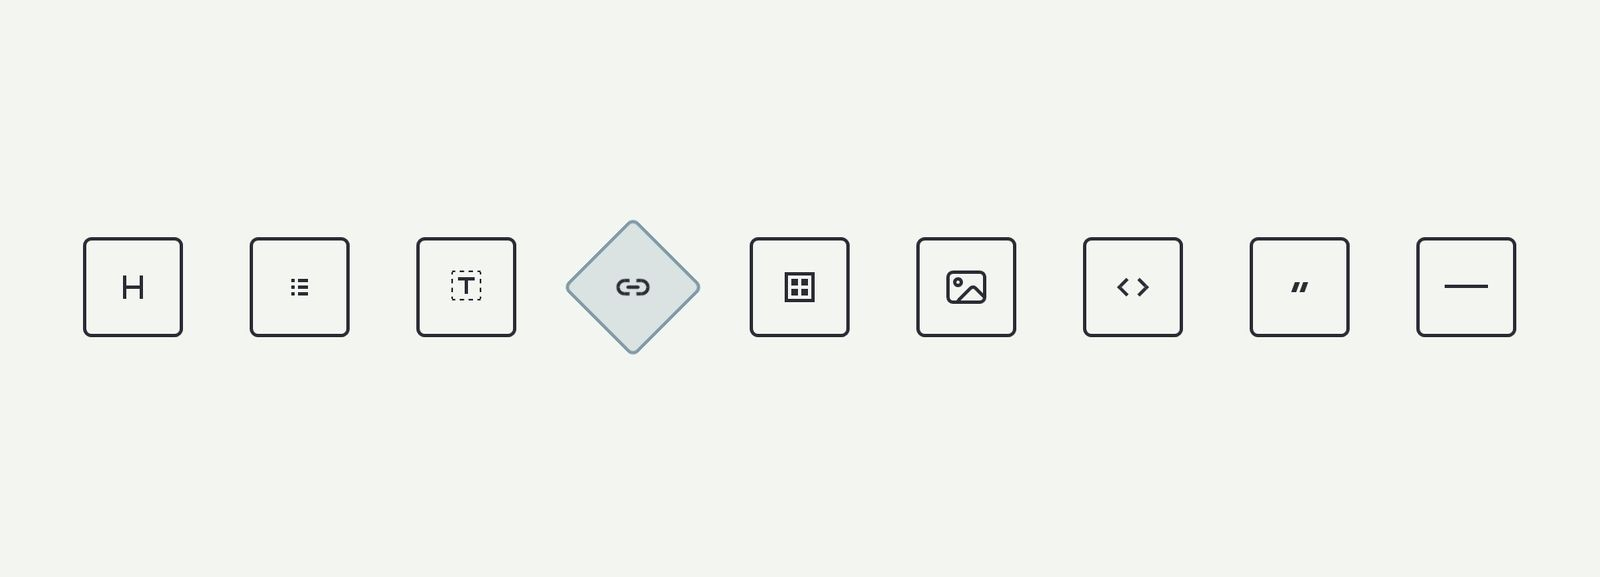 Screenshot of rotating buttons taken from the Markdown Cheat Sheet app.